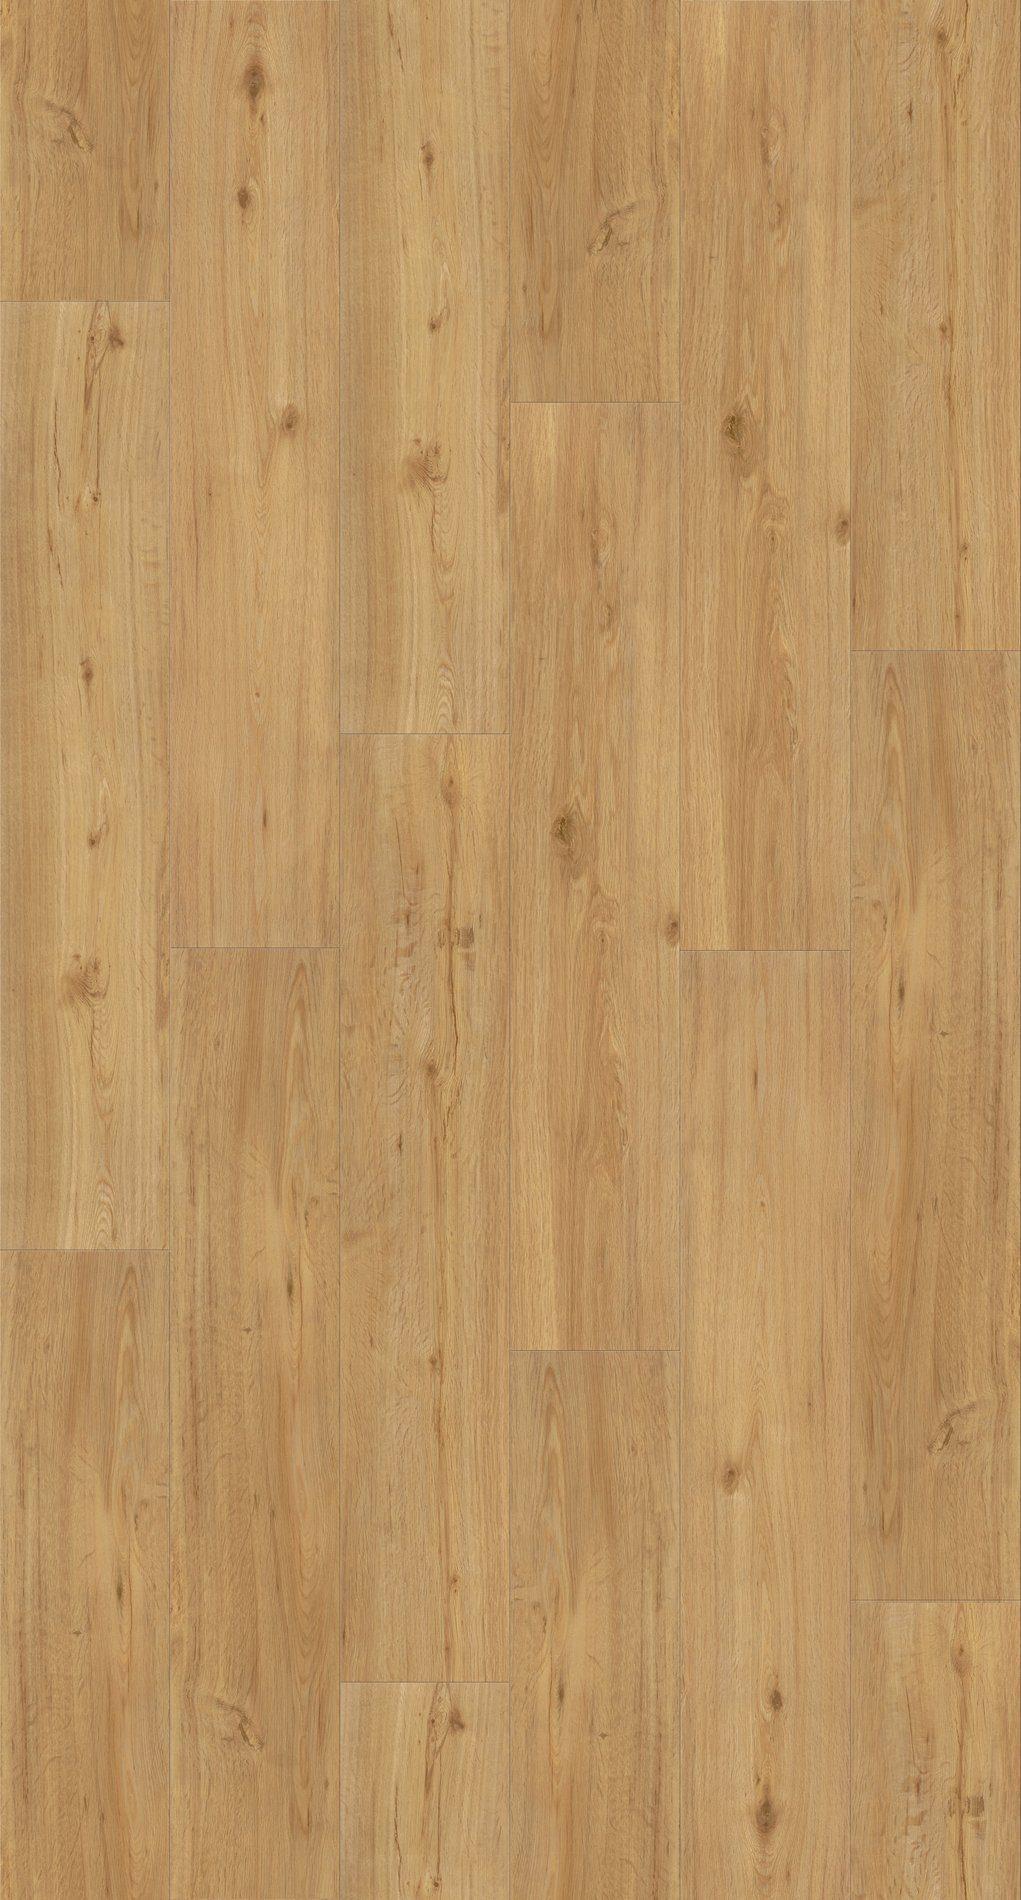 PARADOR Packung: Vinylboden »Basic 4.3 - Eiche Natur«, 1213 x 219 x 4,3 mm, 2,4 m²